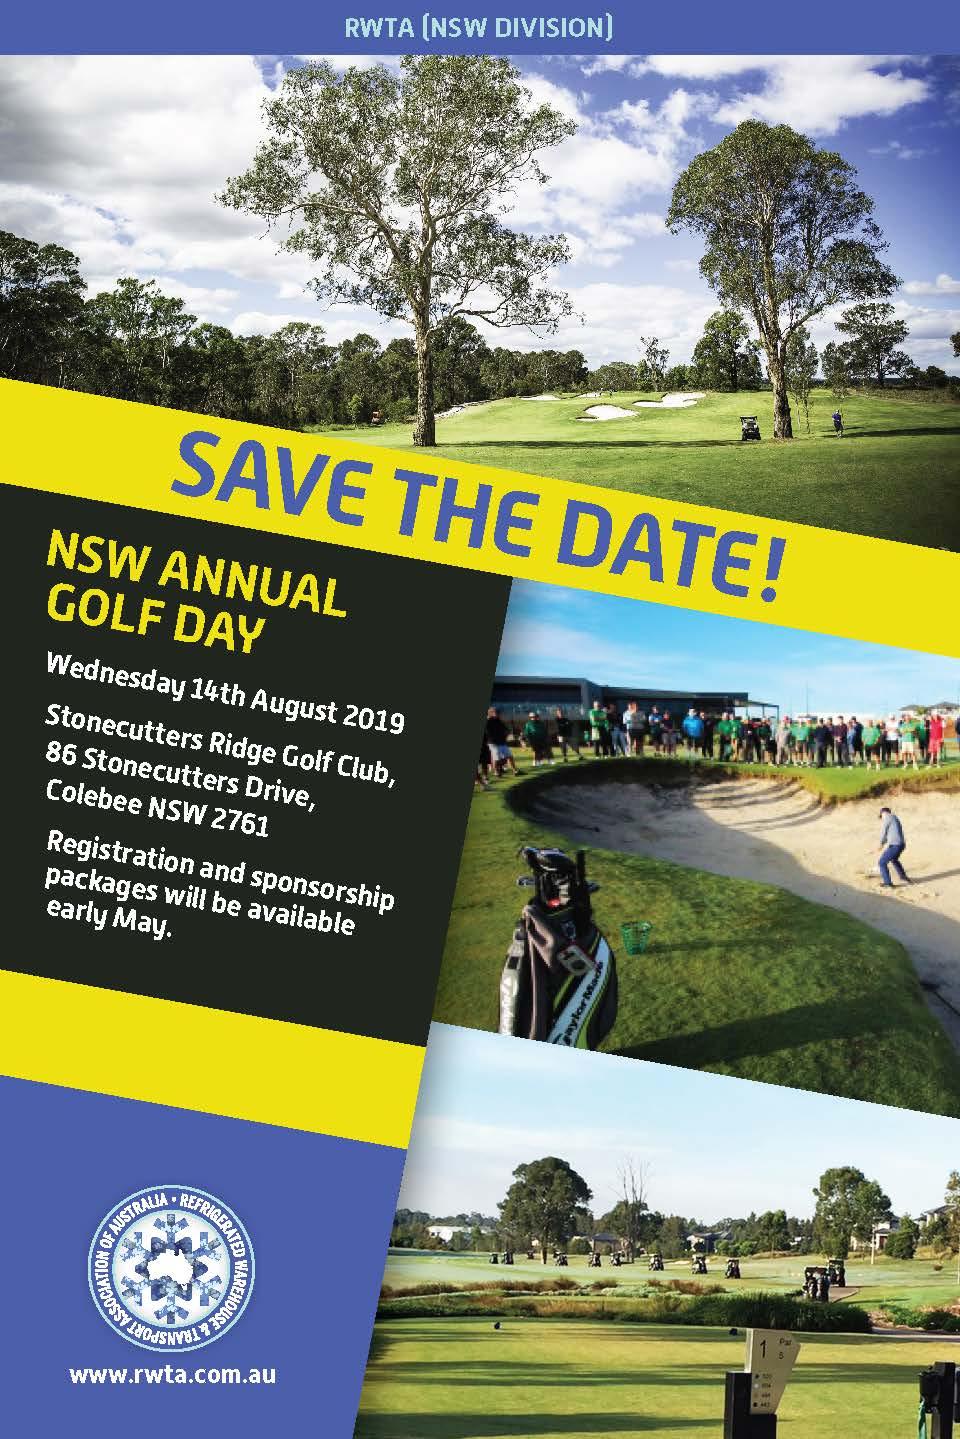 12447_RWTA_NSW Golf Day_STD_F.jpg